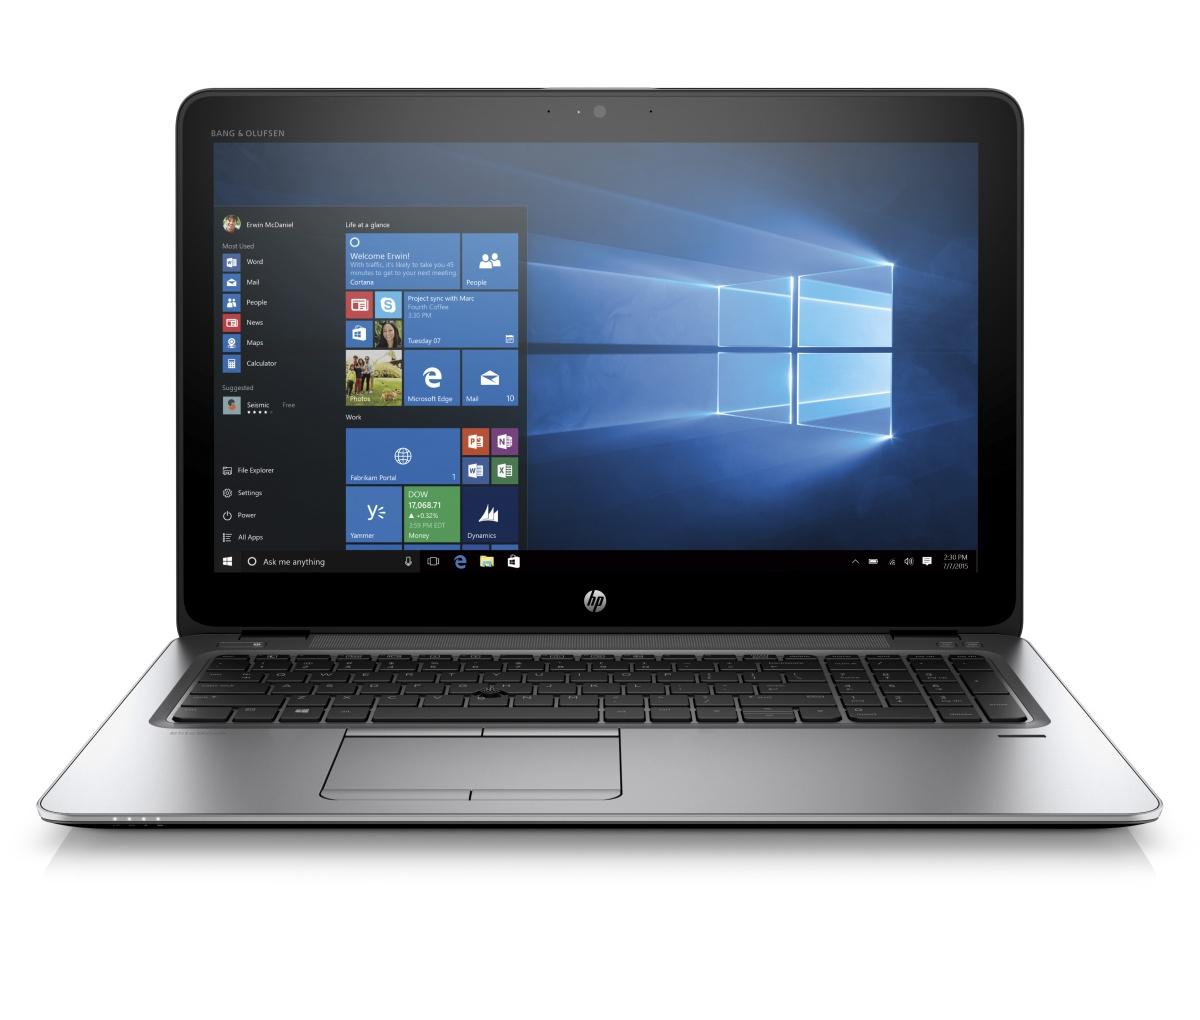 HP EliteBook 850 G3 i5-6200U/4GB/256GB SSD/15,6'' FHD/backlit keyb/Win 10 Pro downg